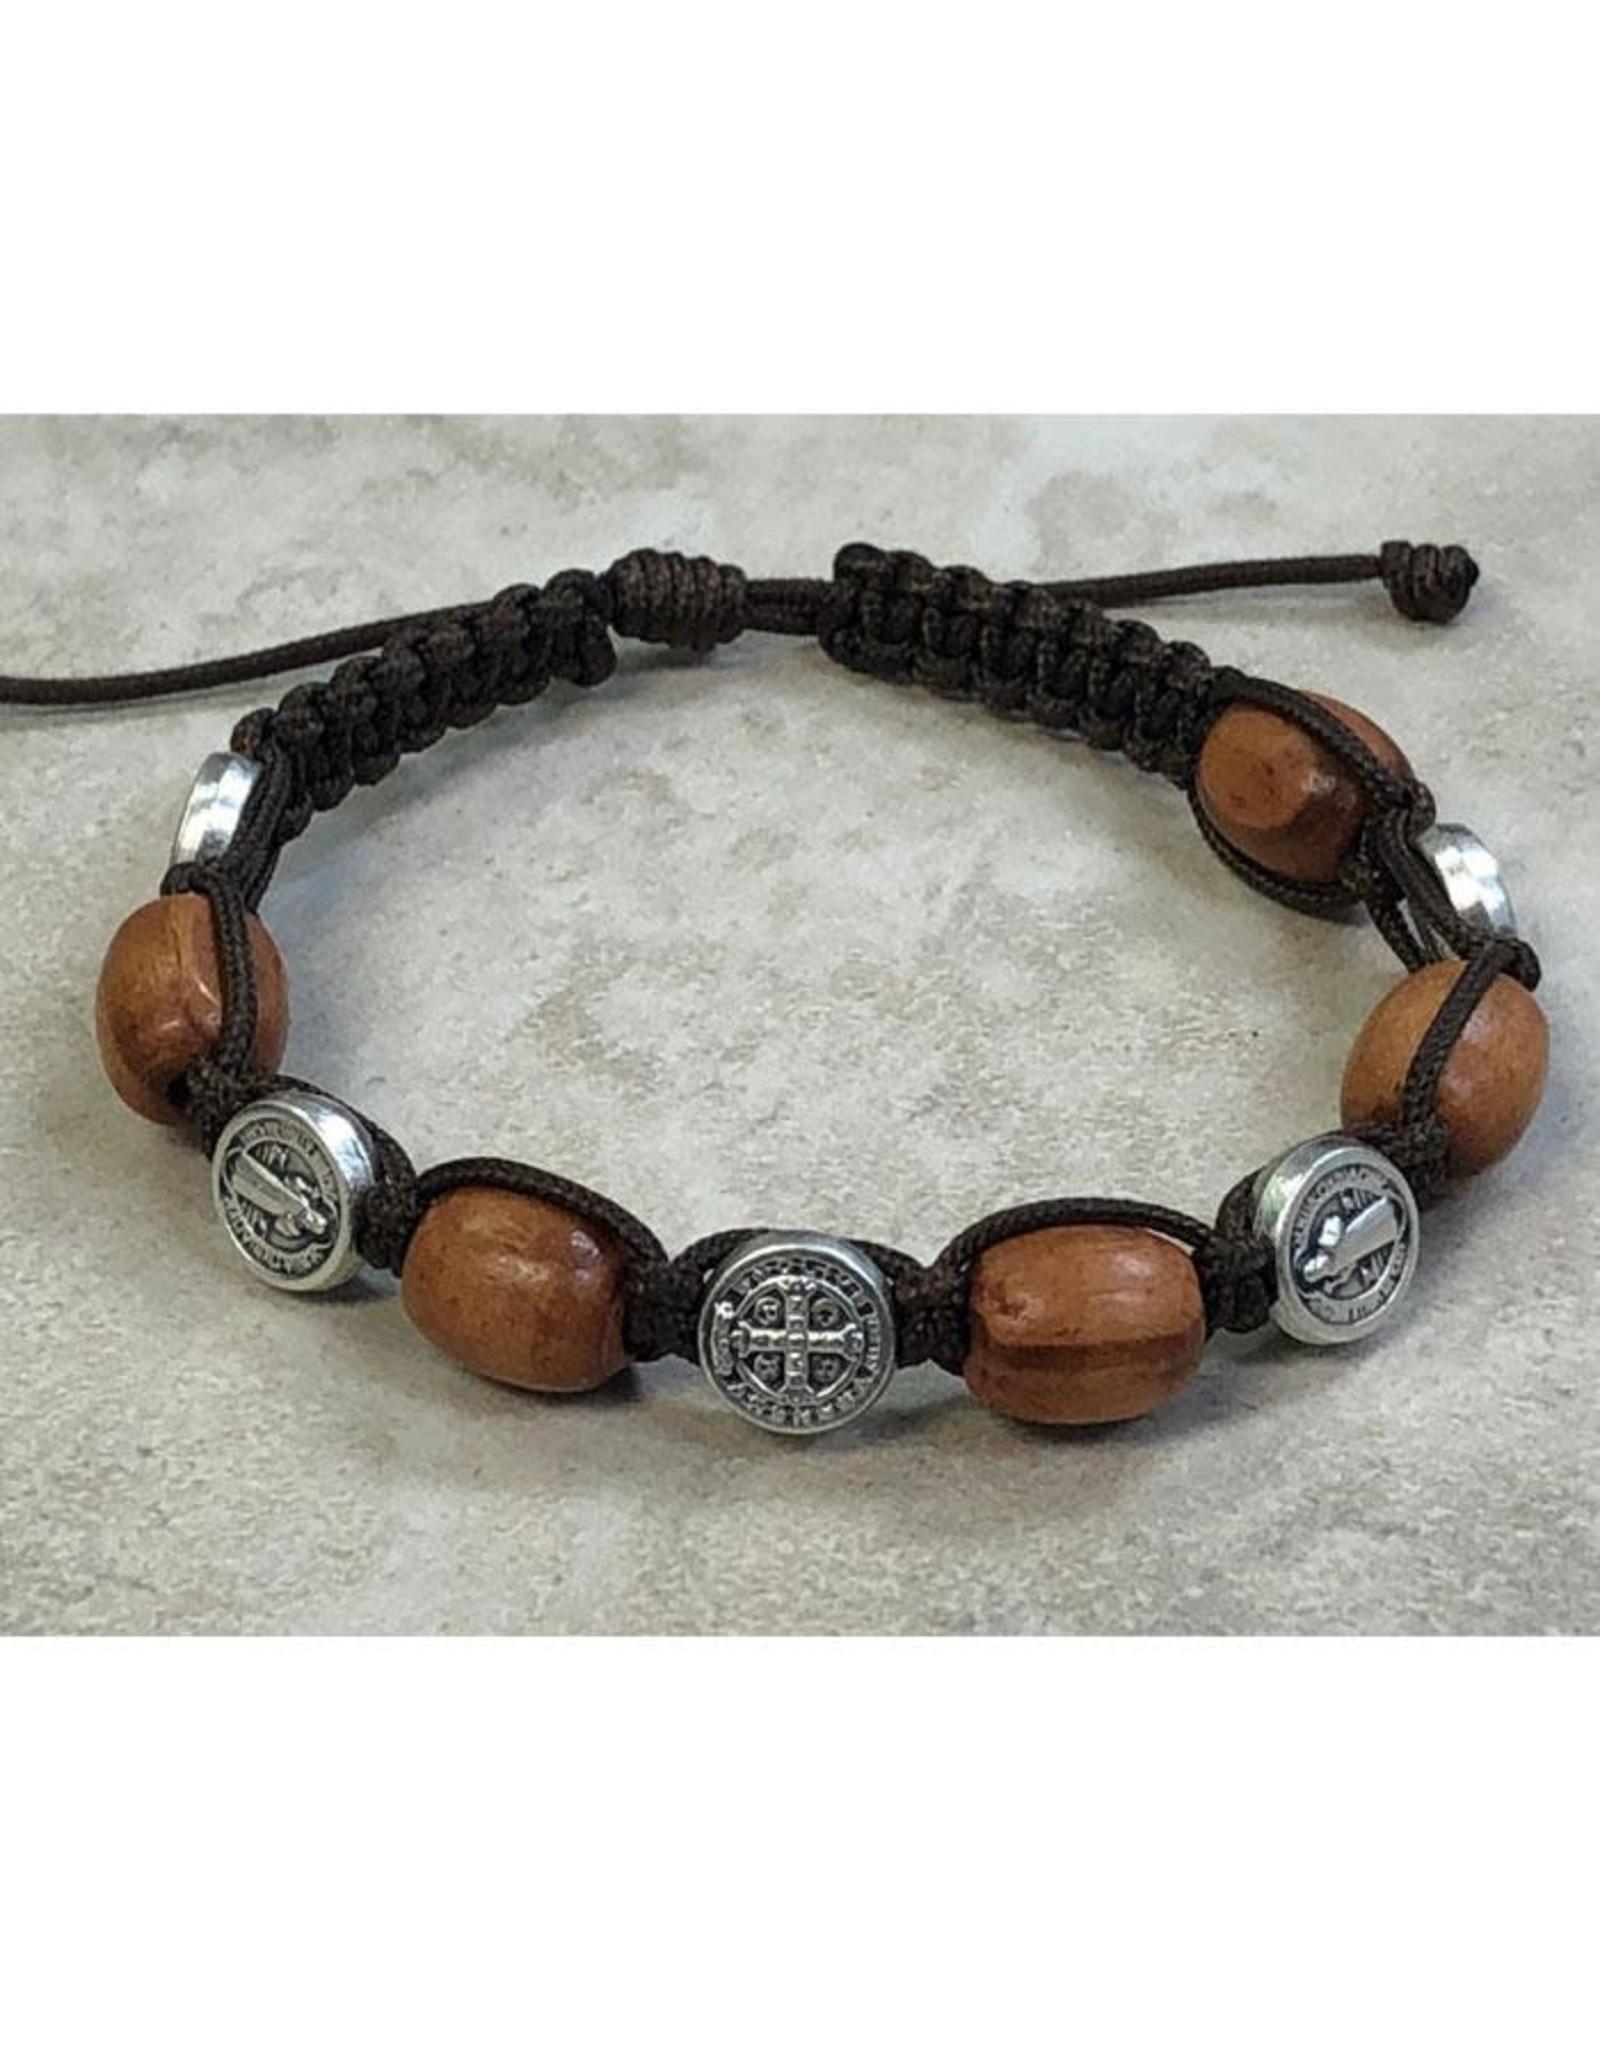 Light Brown Wood with Saint Benedict Medals Slip Knot Bracelet